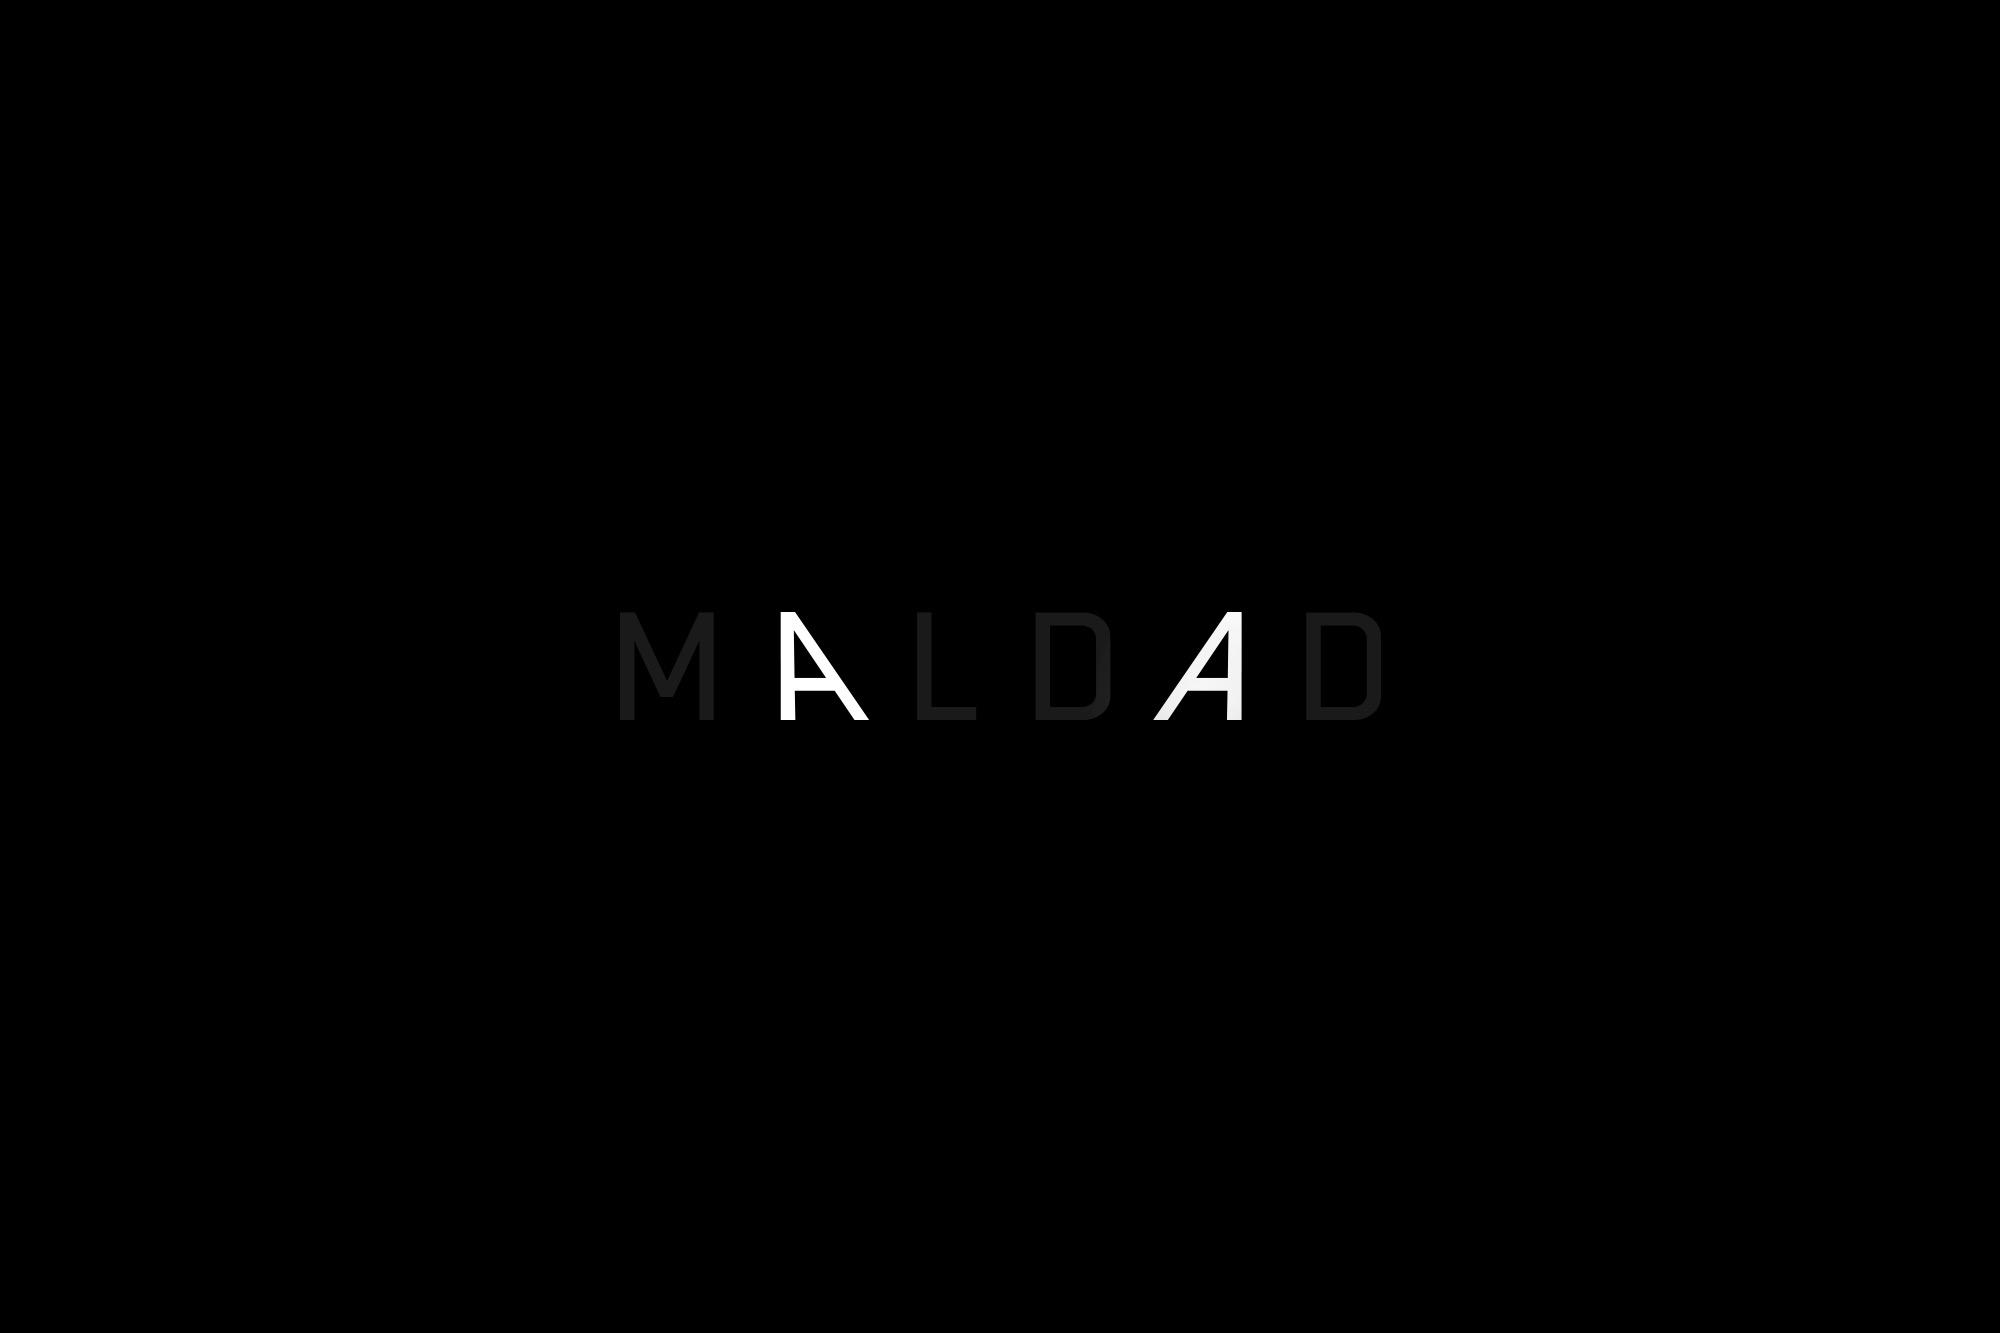 Maldad_3.jpg